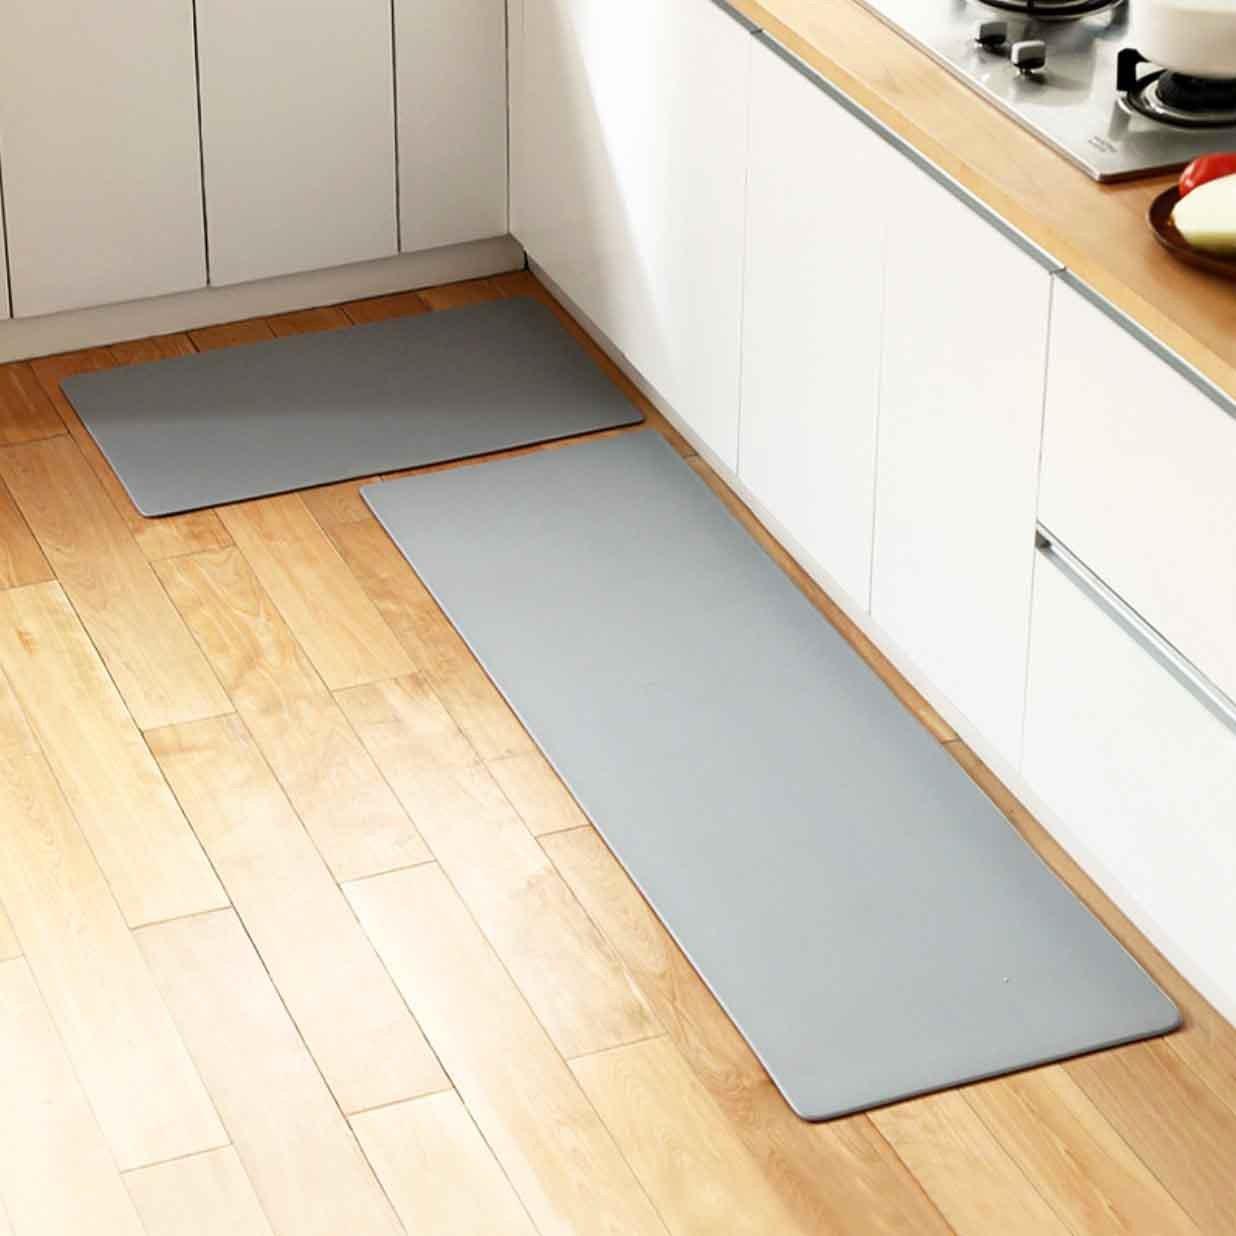 Leathery Anti slip Kitchen Floor Mat   Waterproof PU Leather   Style Degree